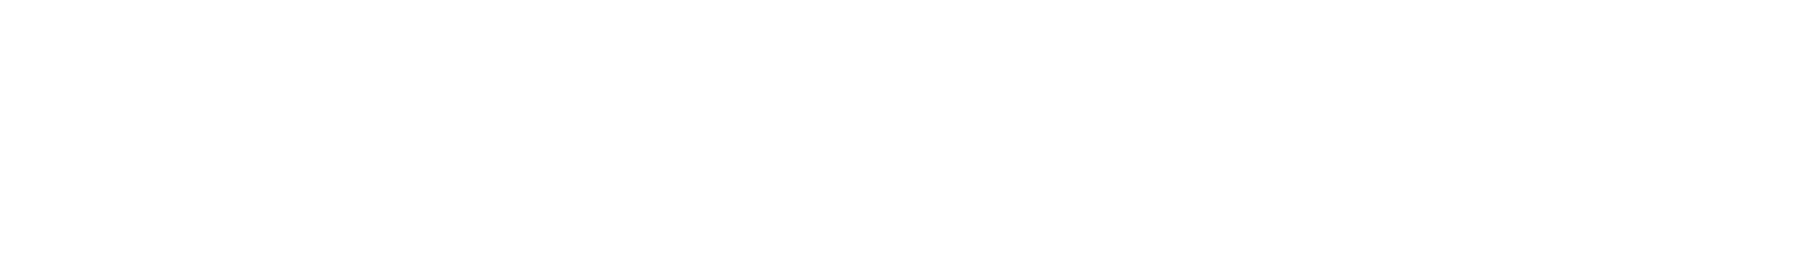 tr08 ch 123 slider f minor